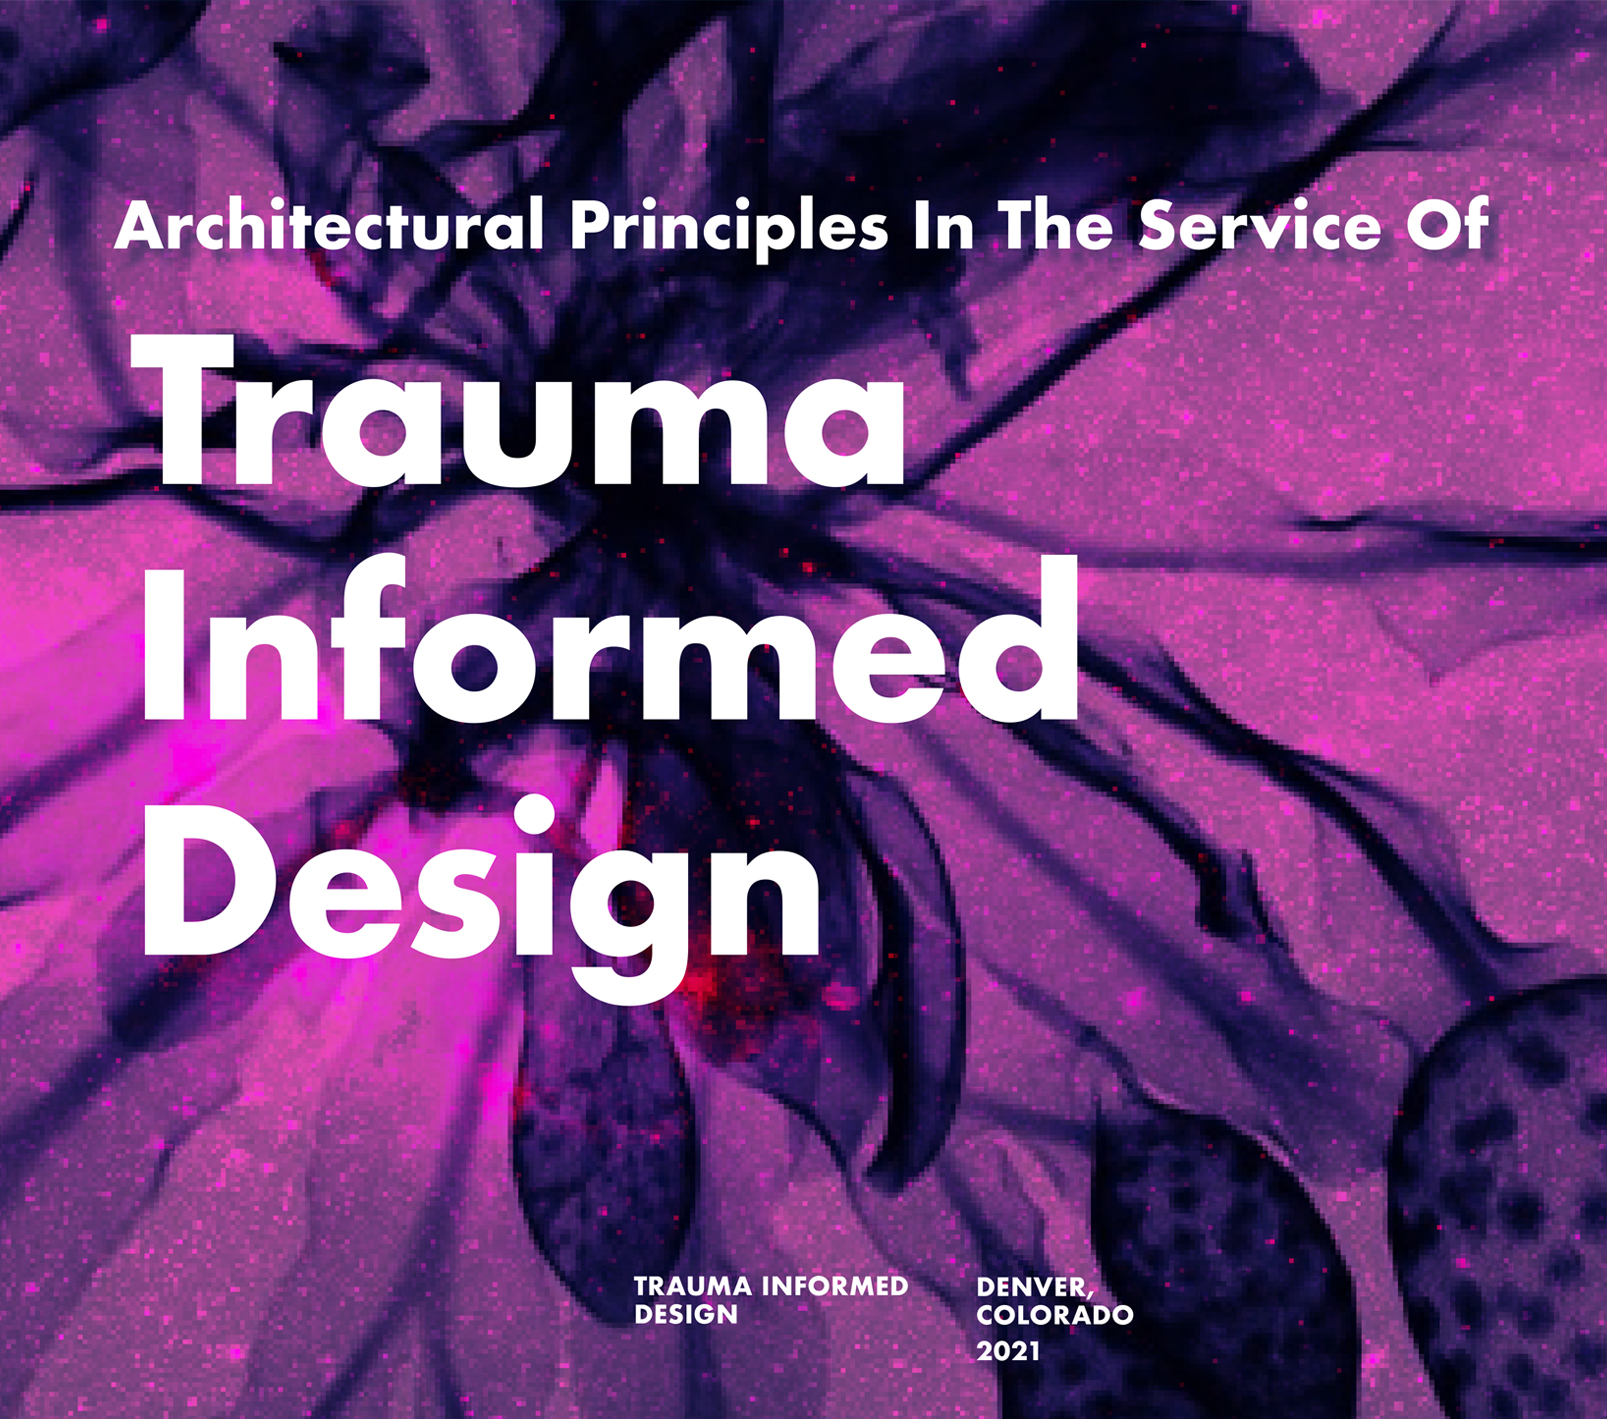 Architectural Principles Trauma-Informed Design